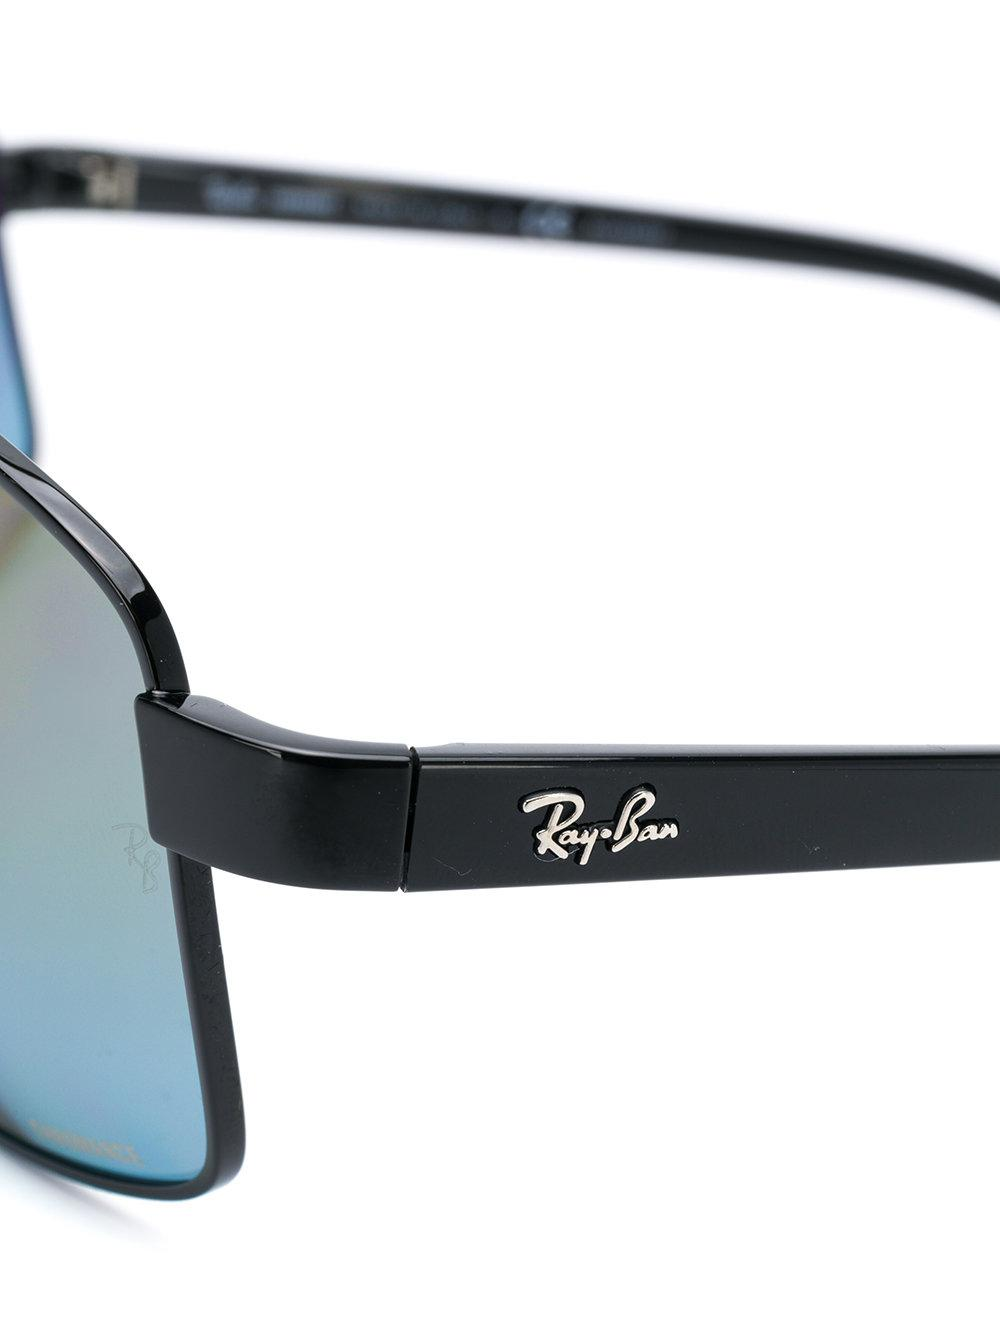 Ray-Ban Rectangular Sunglasses in Black